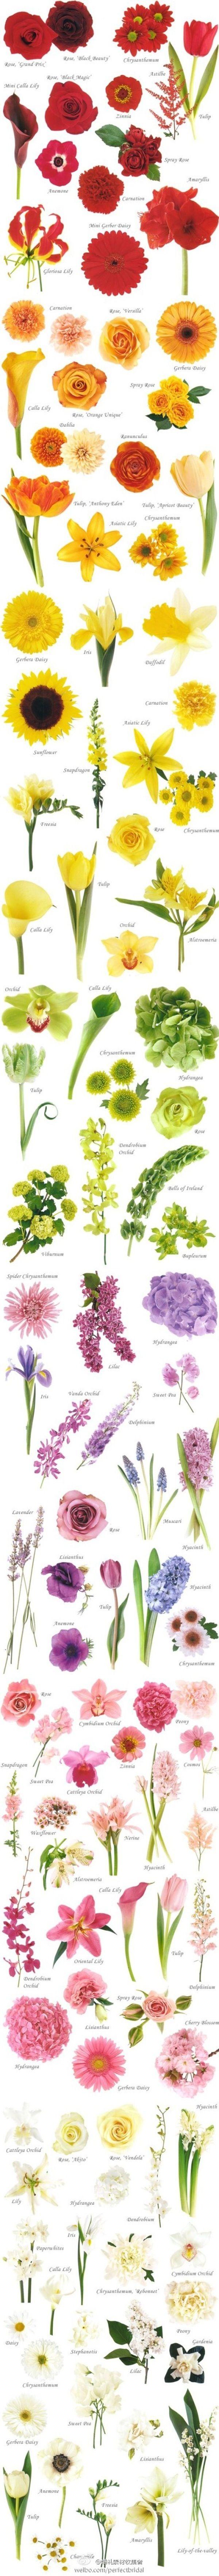 best Flower Arrangements DIY images on Pinterest Flower